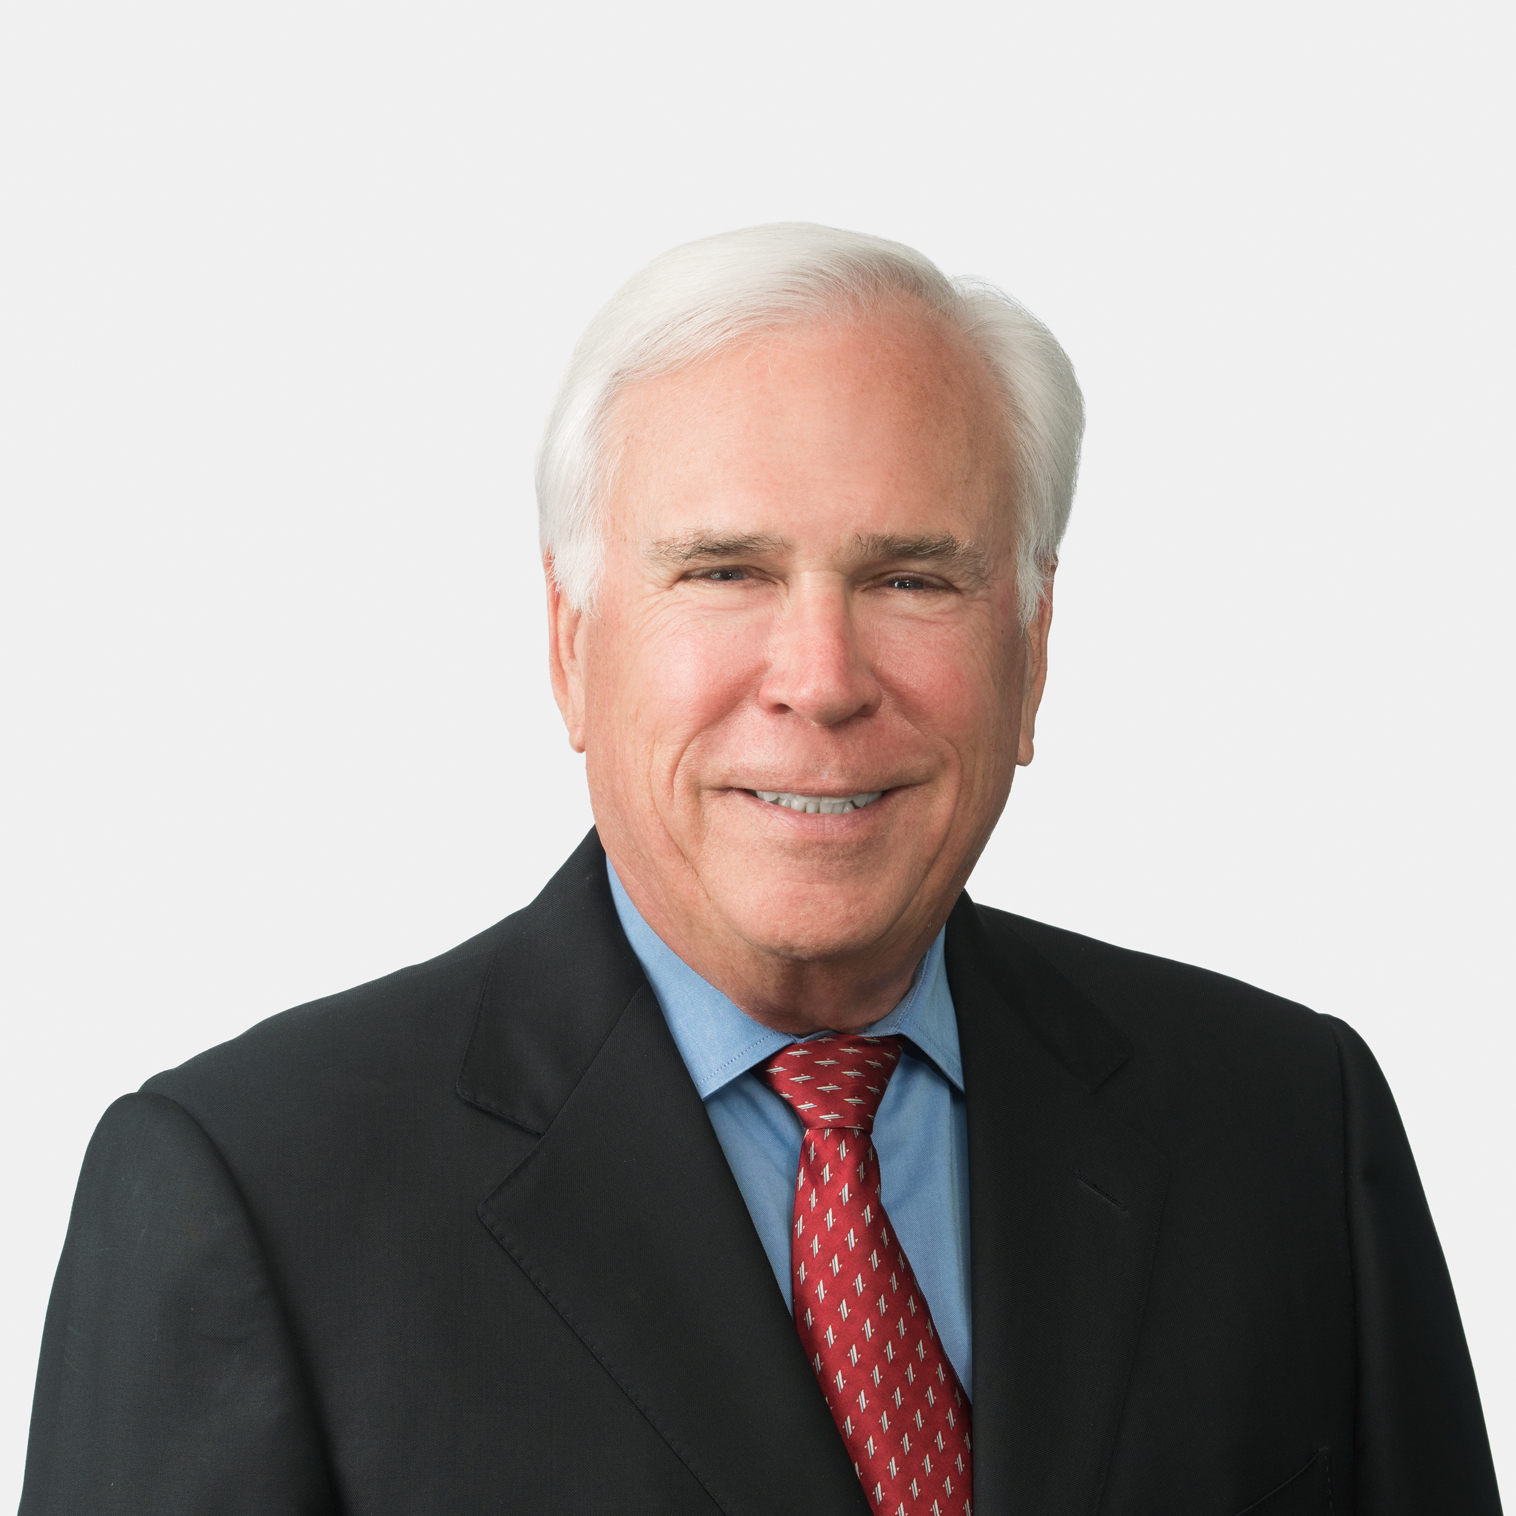 George W. Powell Jr., MAI